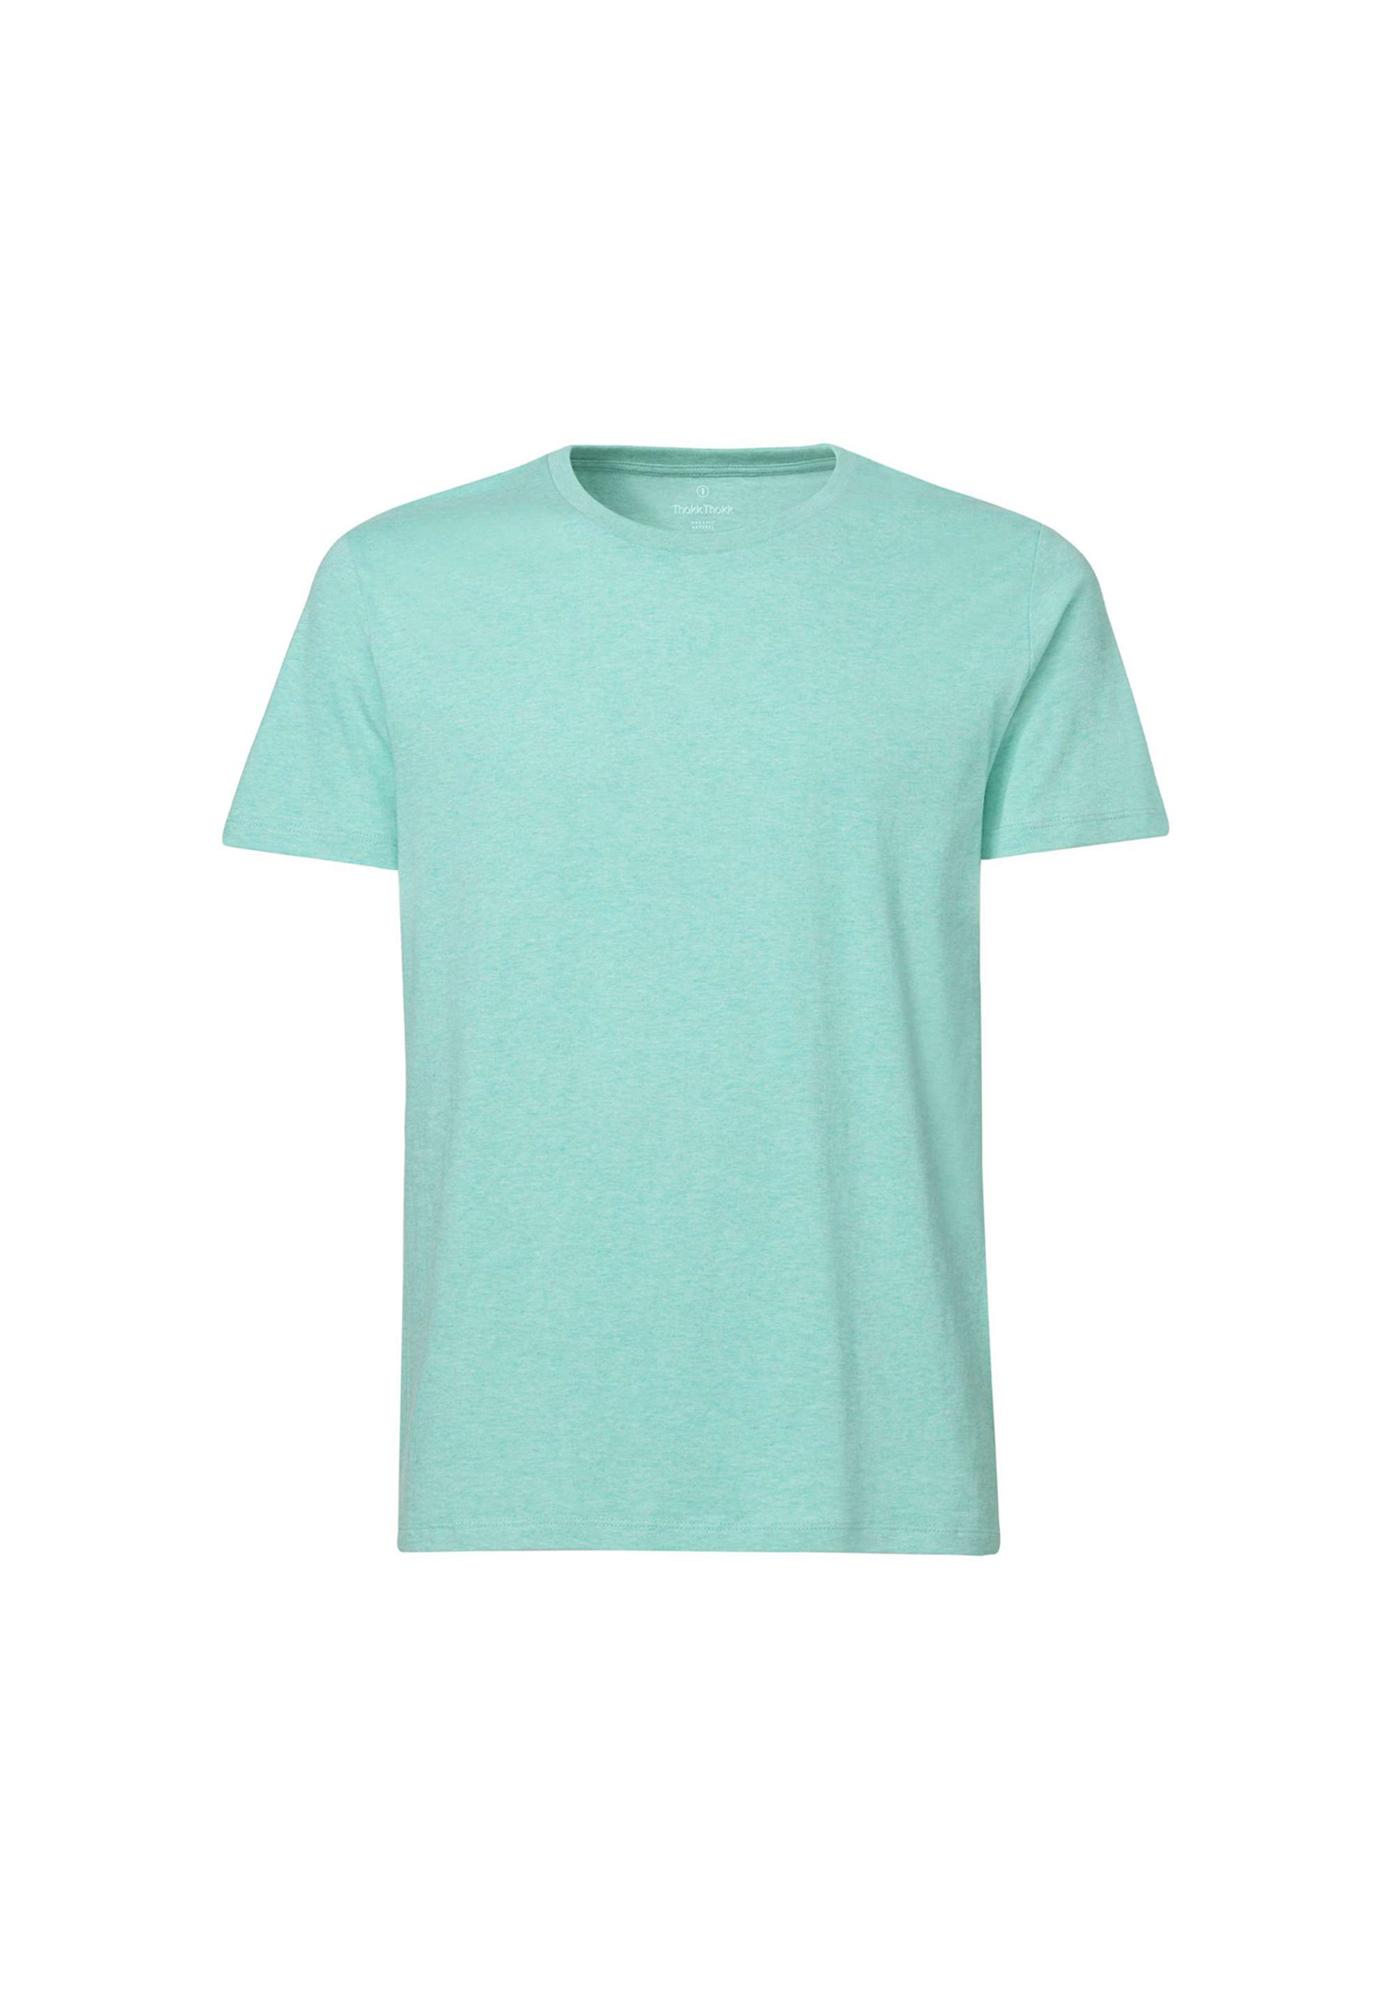 T-Shirt Mid Heather Green